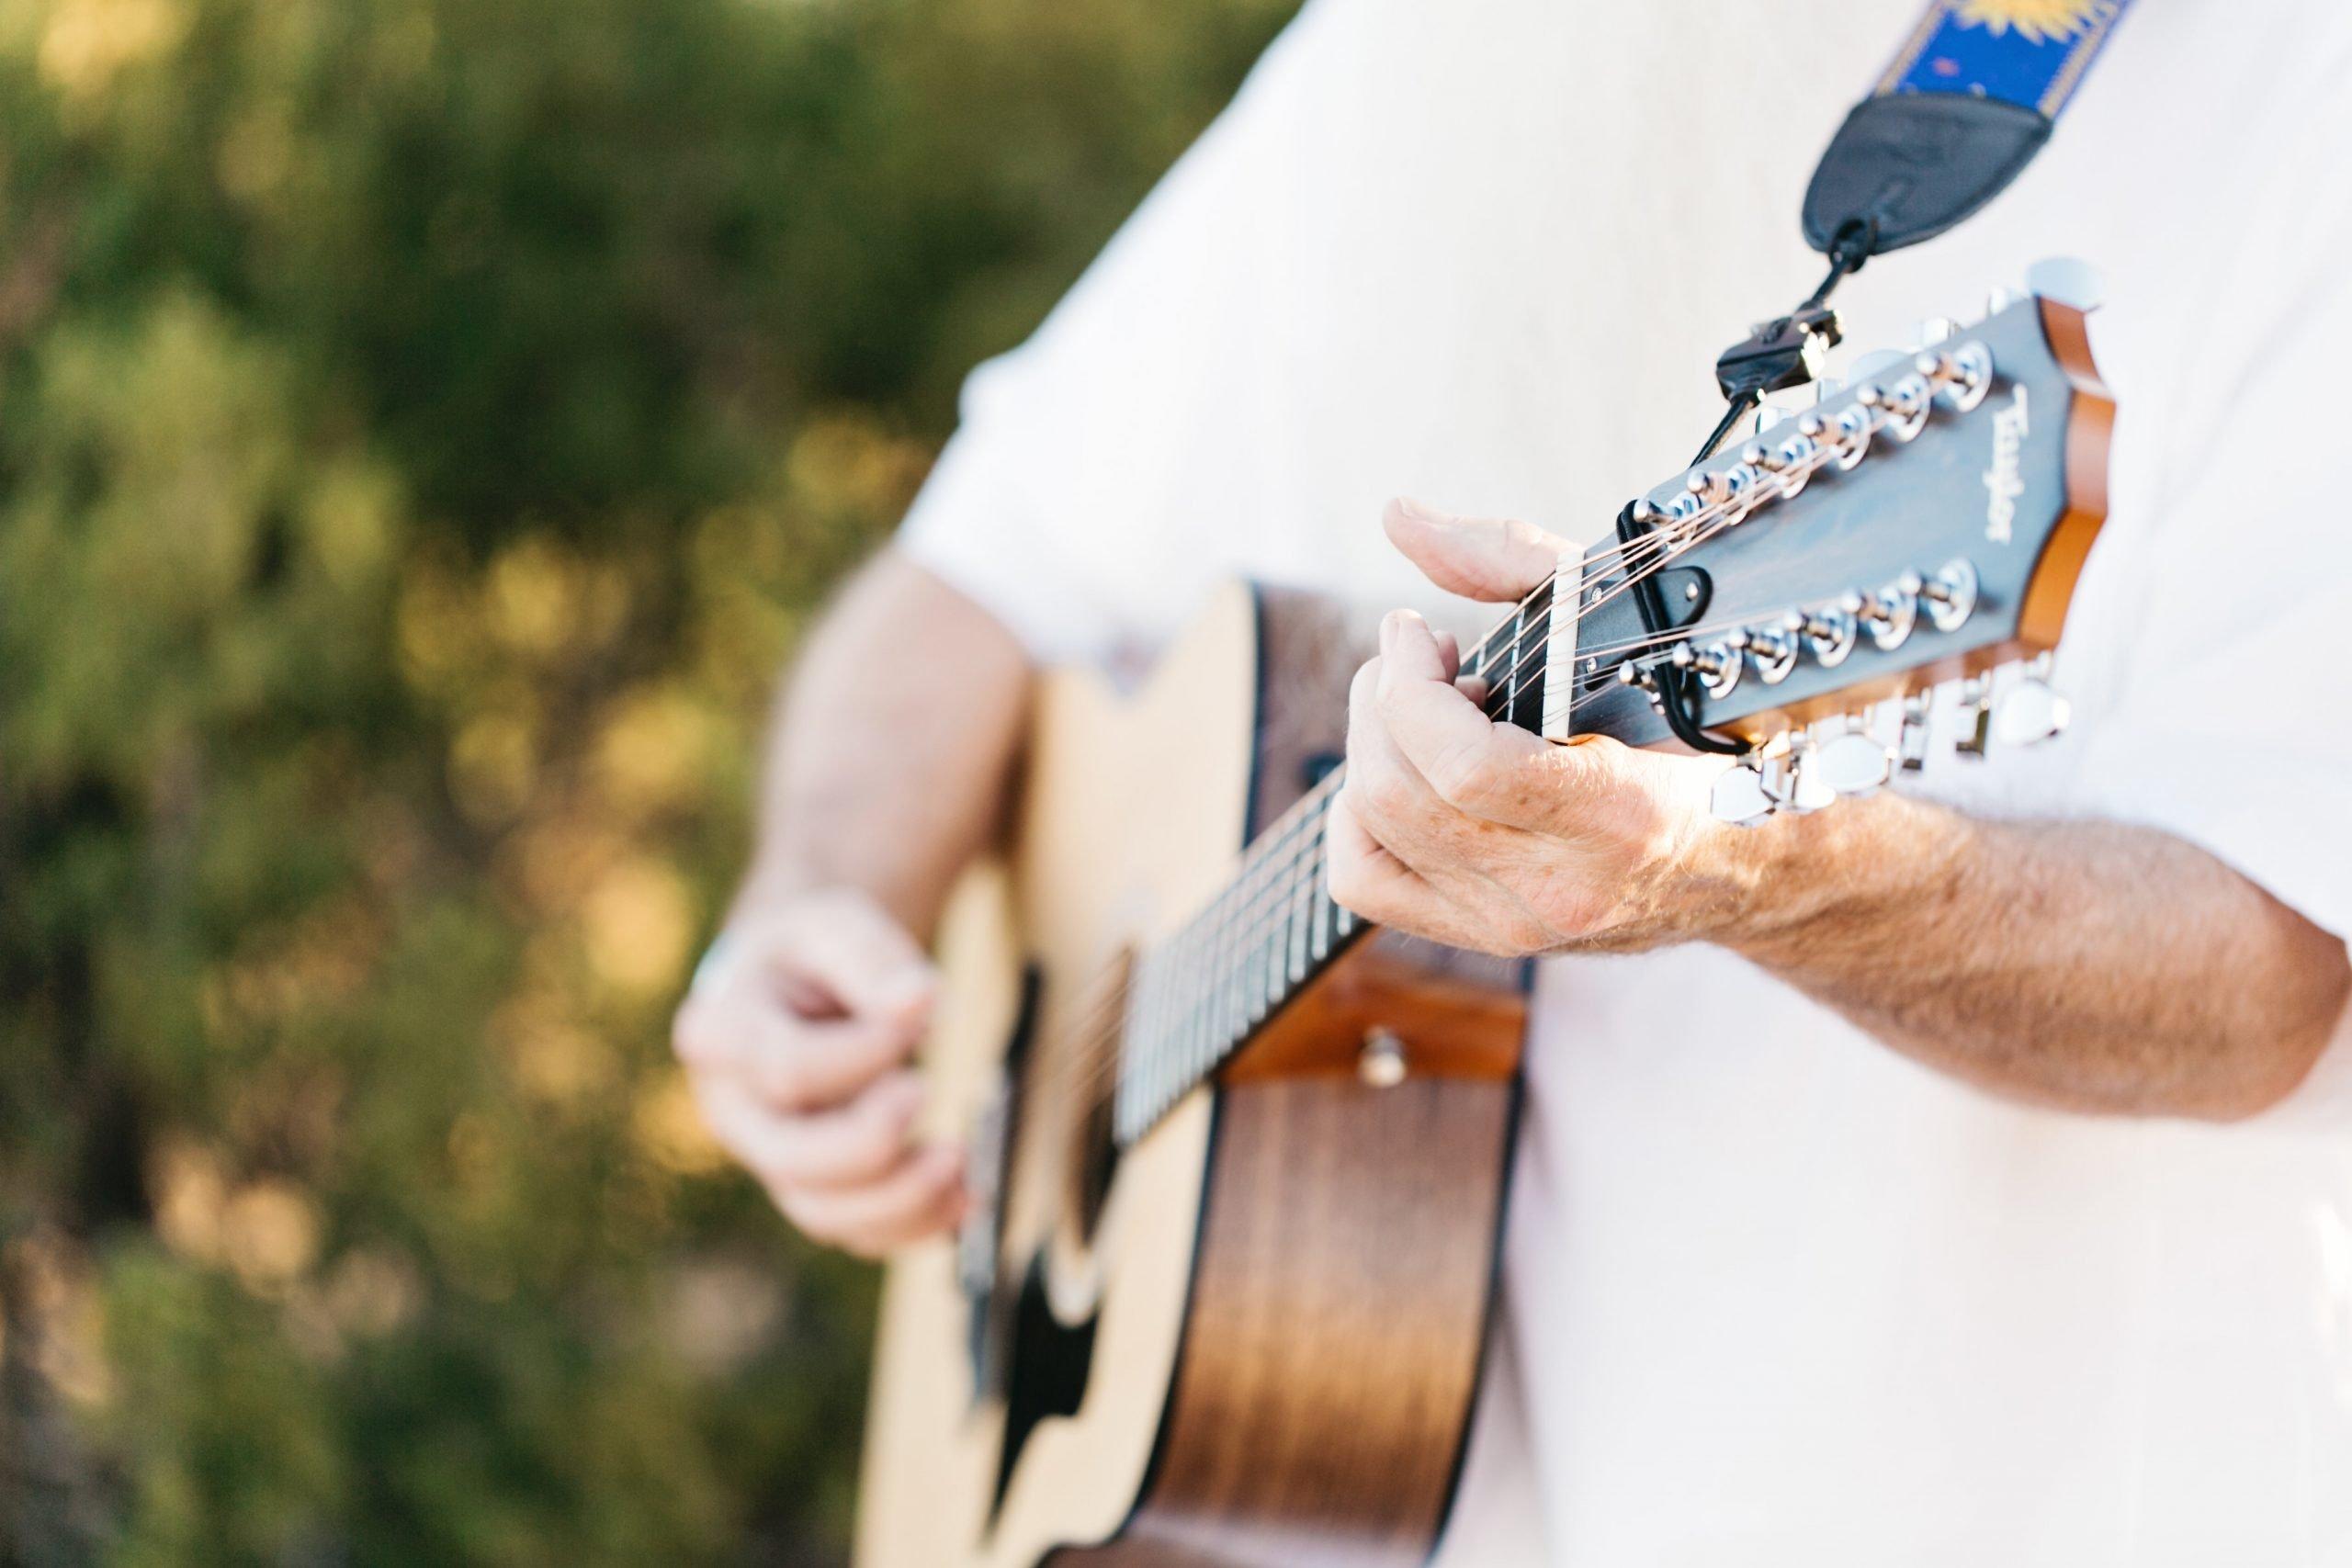 Livtar singh playing guitar